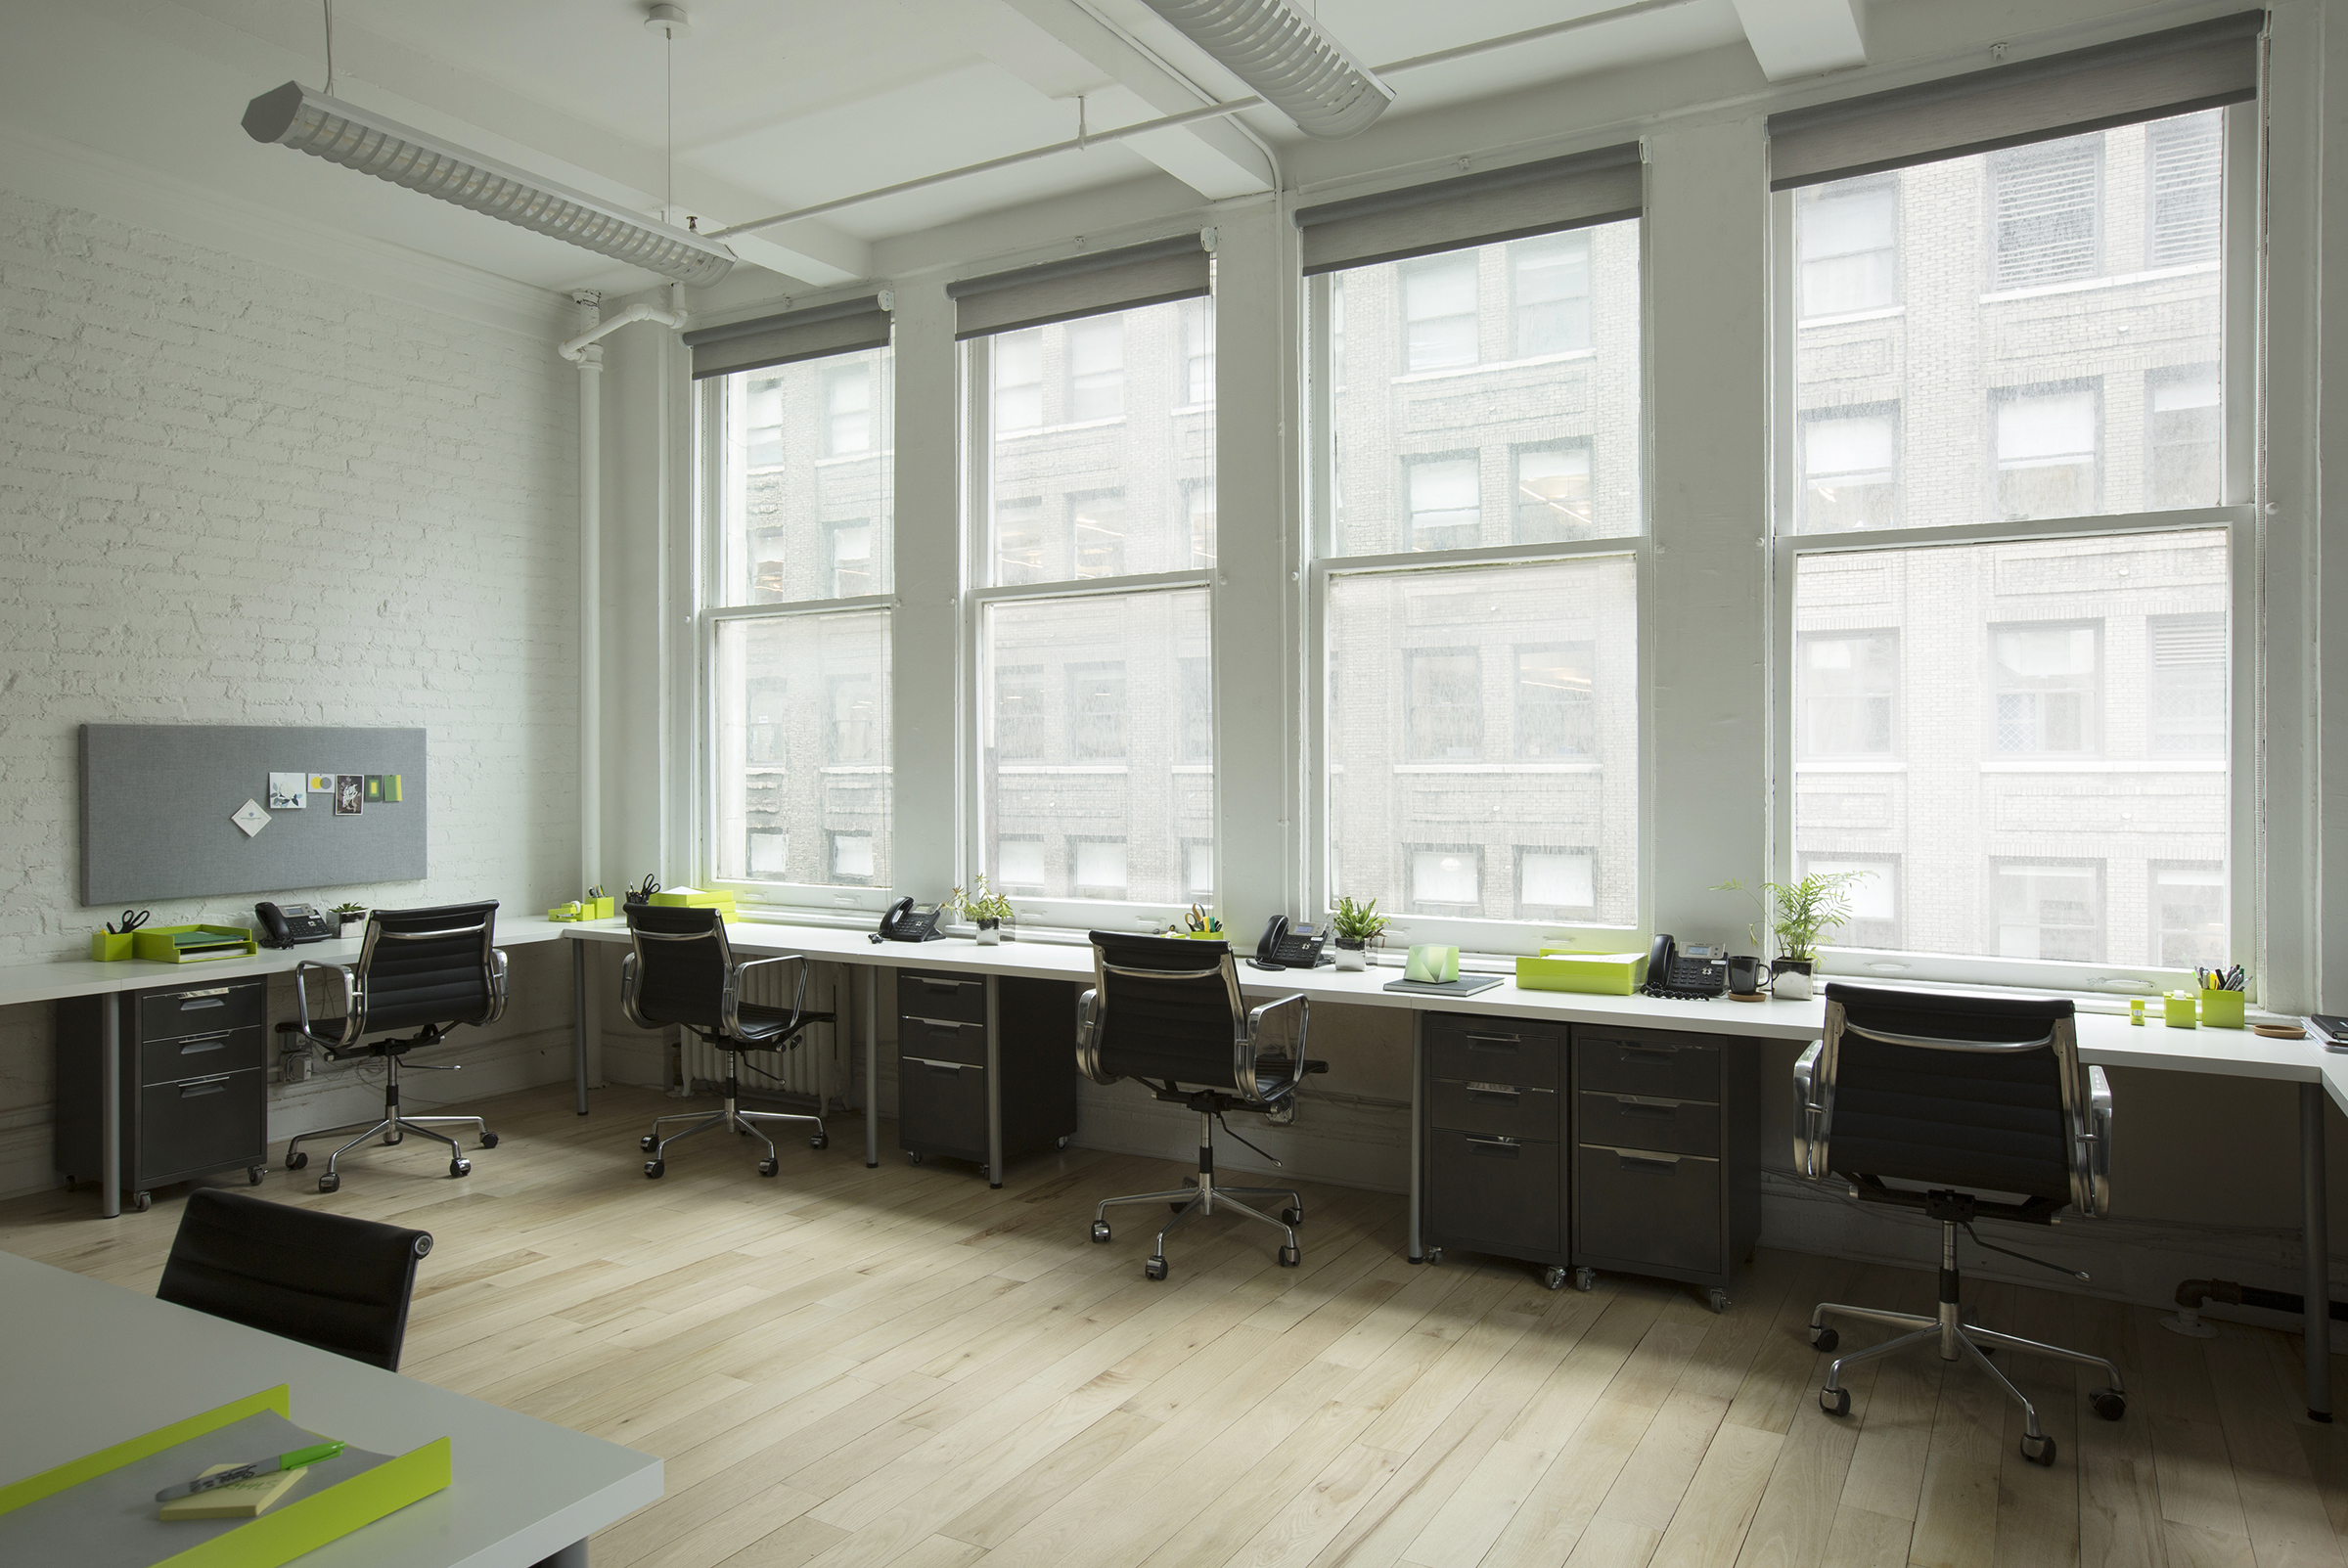 06 OP Office.jpg